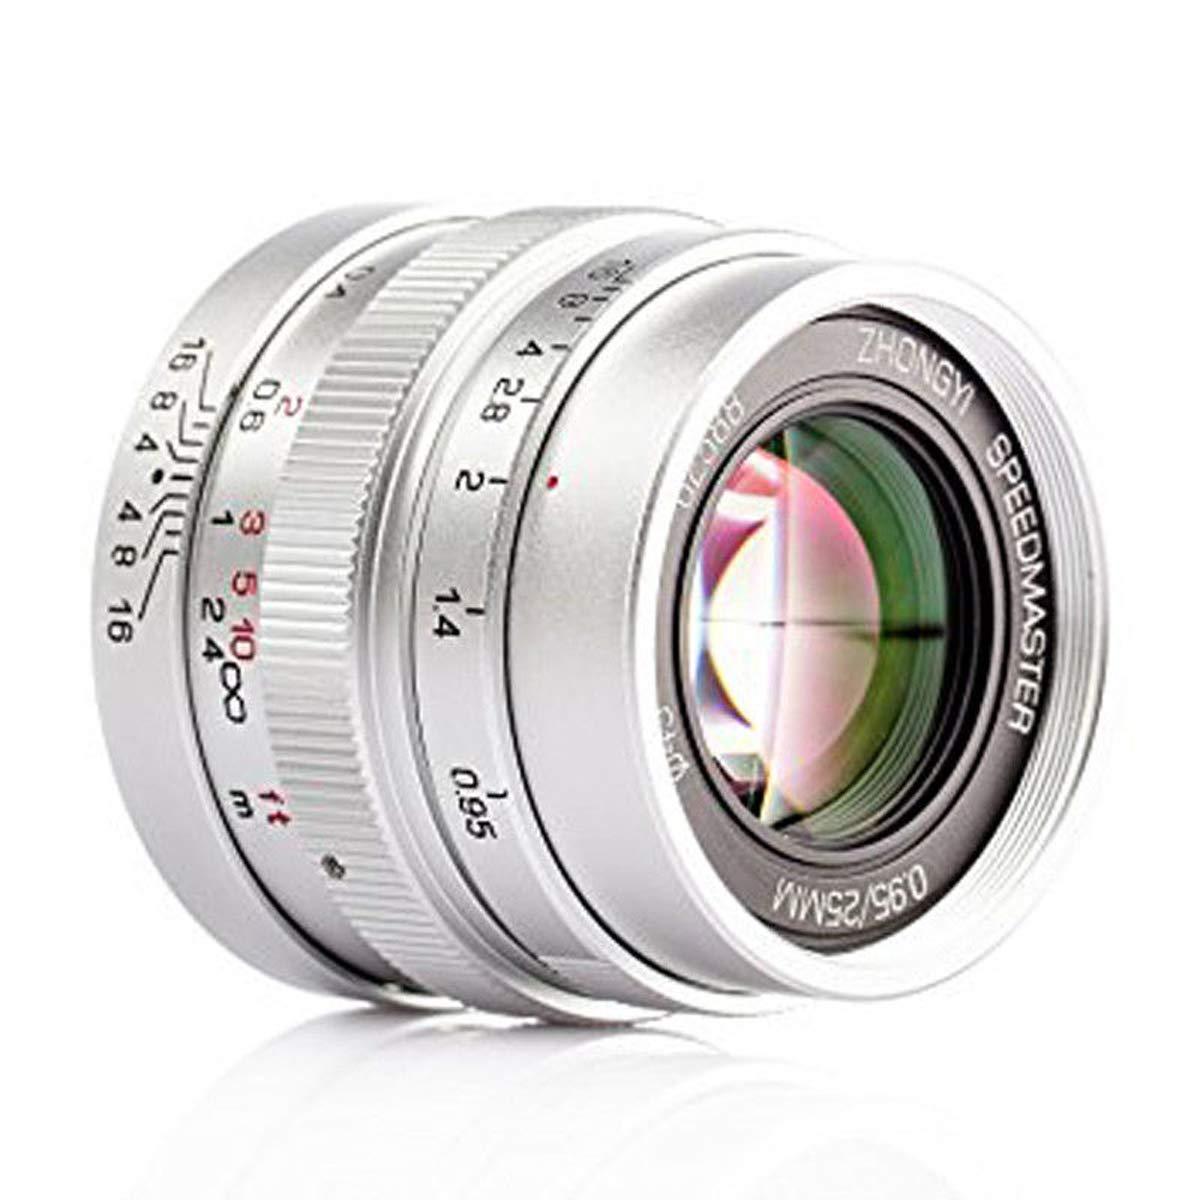 Zhongyi Mitakon Speedmaster 25mm f/0.95 マイクロフォーサーズカメラ OMD GH4 EM1 - シルバーカラー   B07JCBT9HK